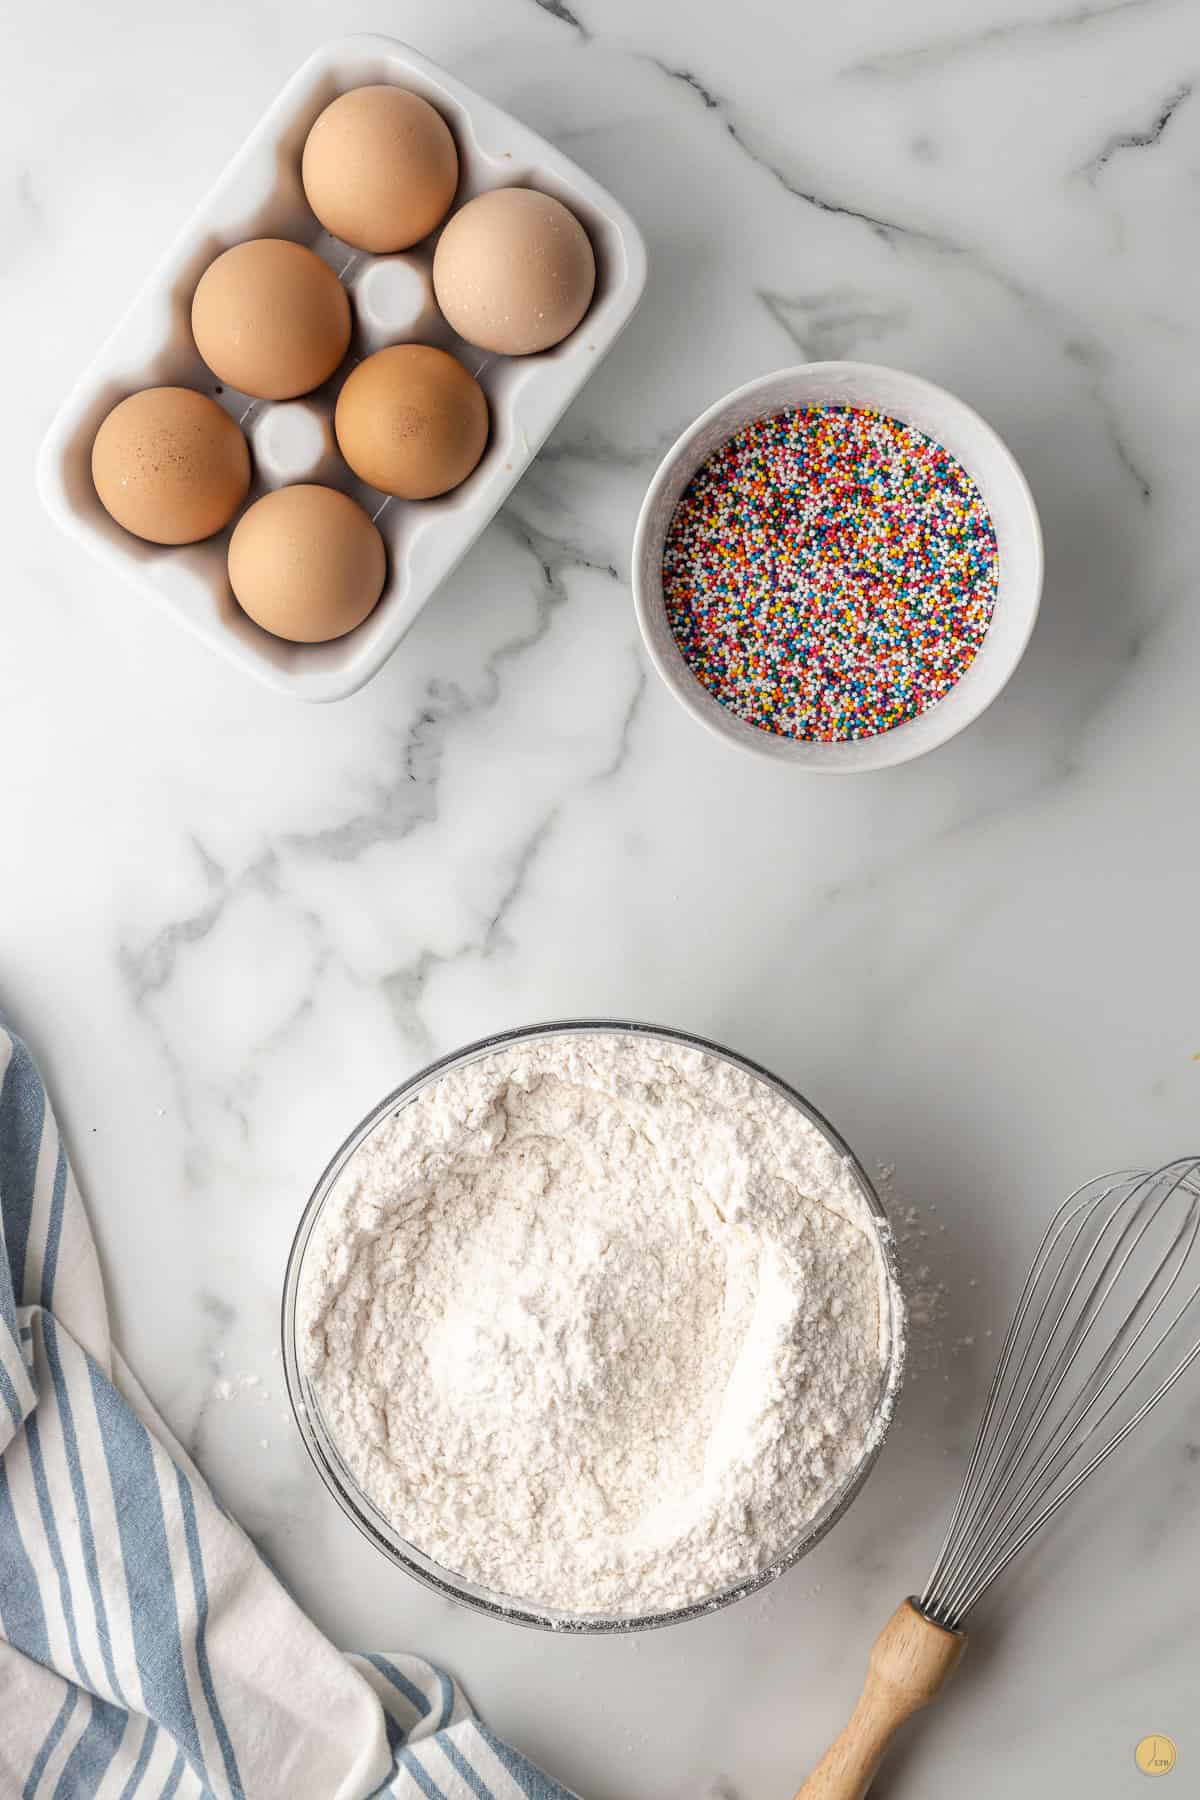 dry cookie ingredients in a bowl